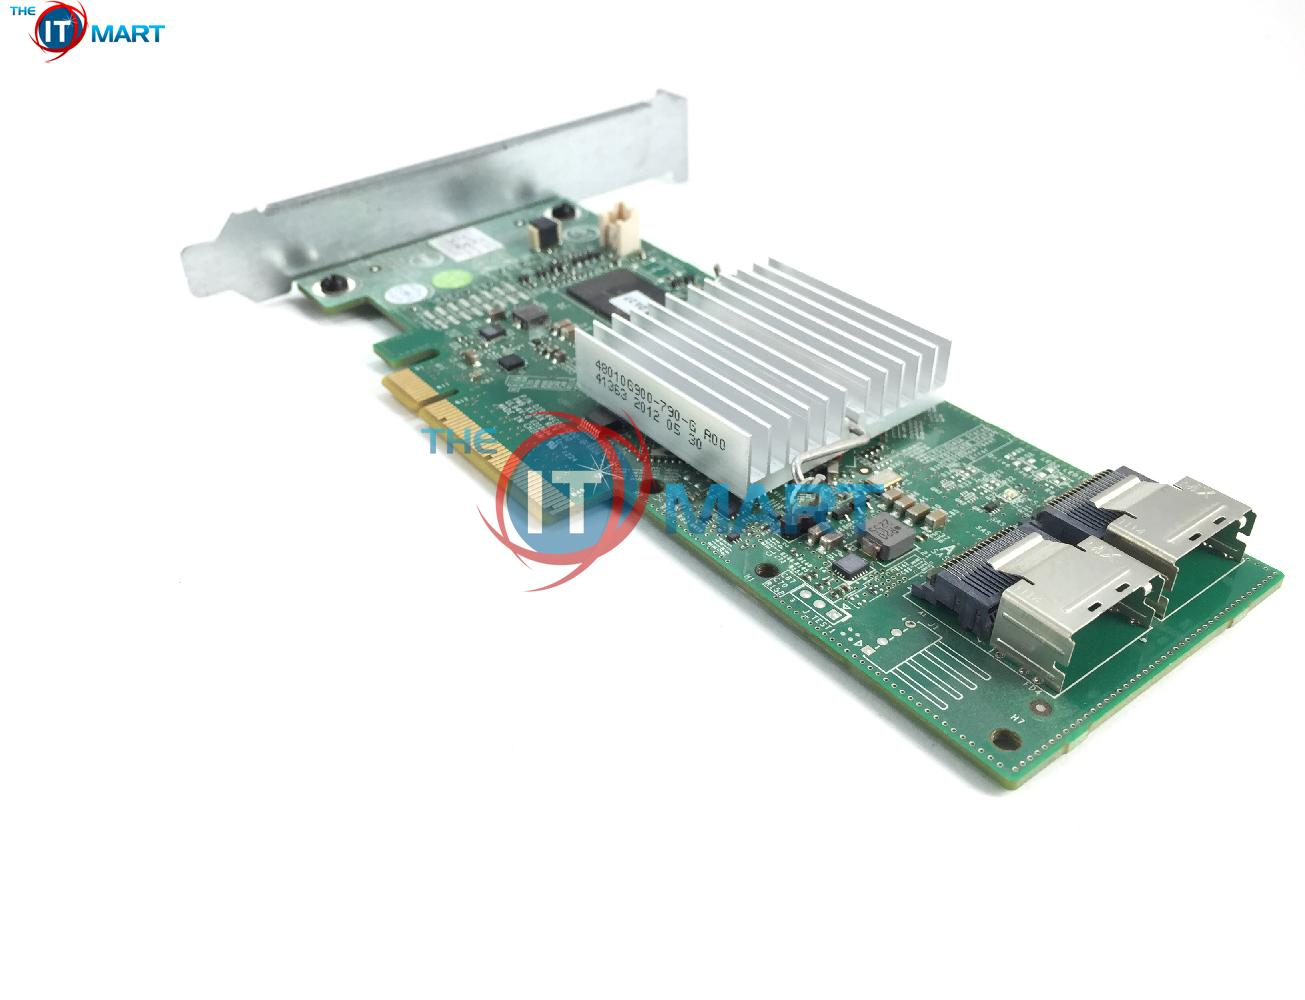 DELL POWEREDGE H310 8 PORT 6GBPS SAS/SATA RAID CONTROLLER PCI-E (03P0R3)